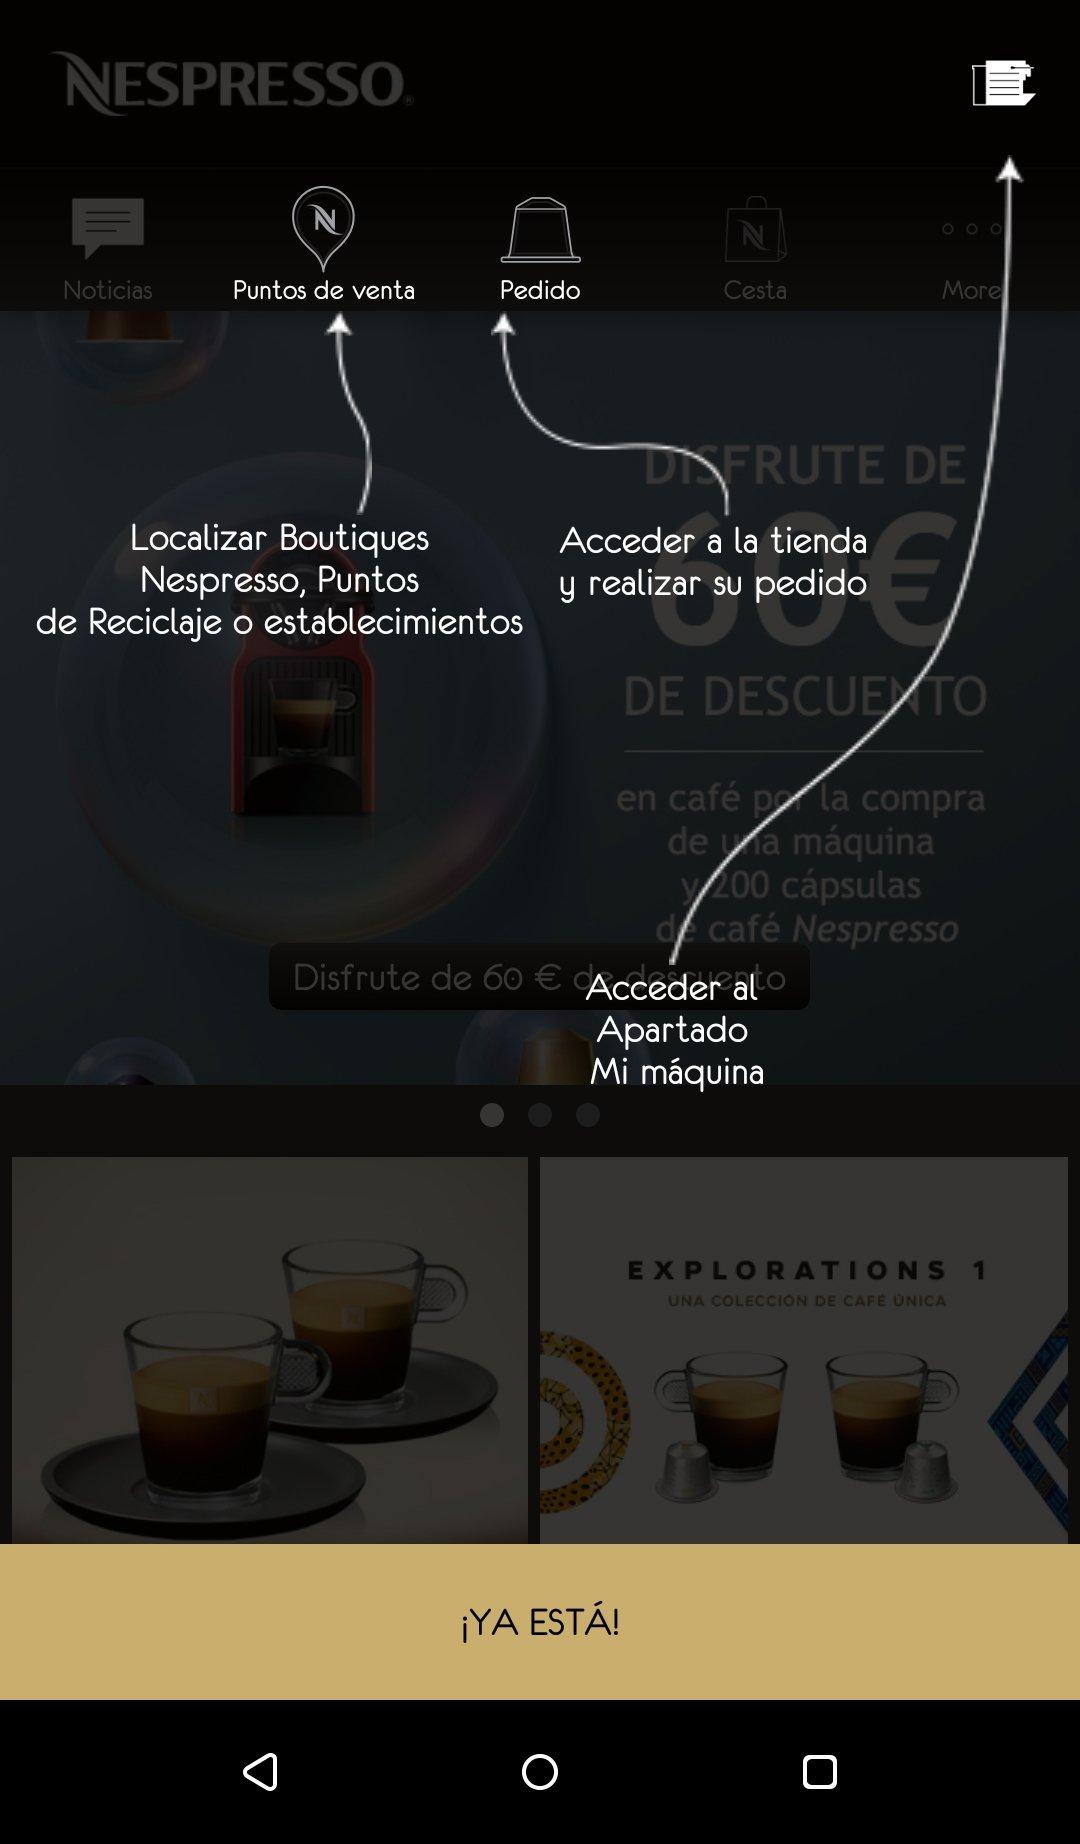 Nespresso Android image 7